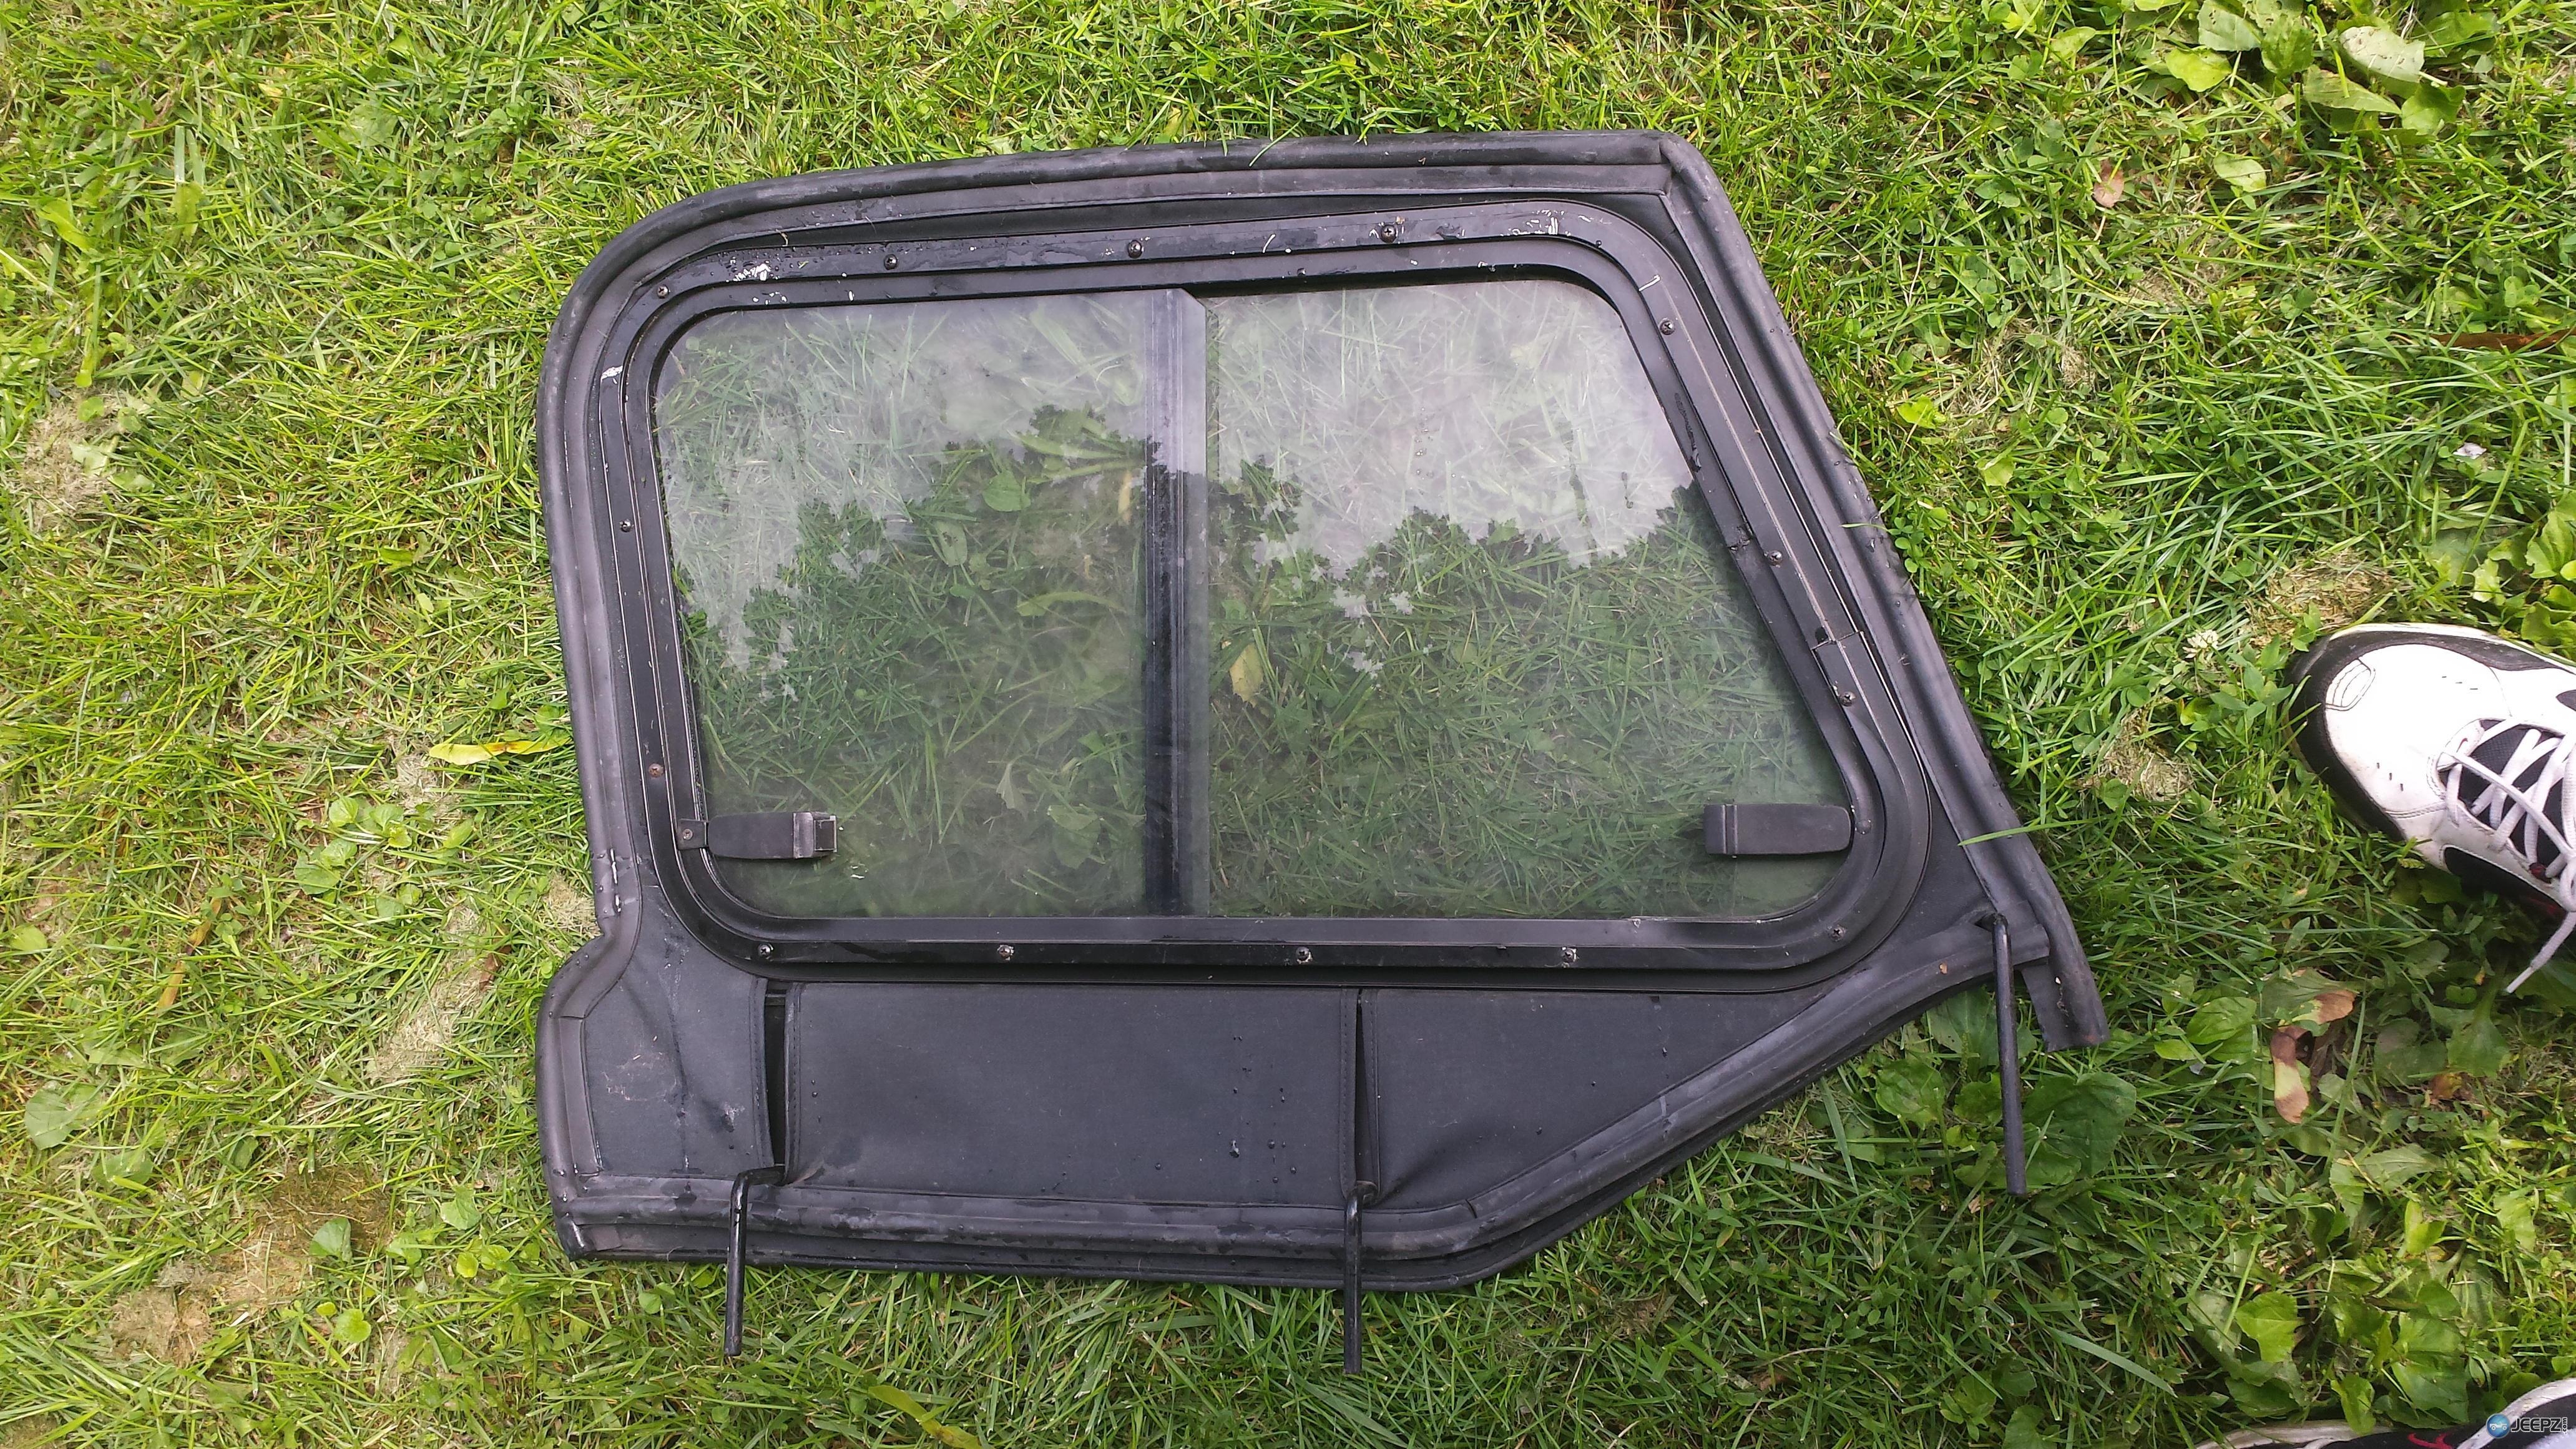 97 06 Tj Upper Door Skins With Sliding Glass Windows Pair